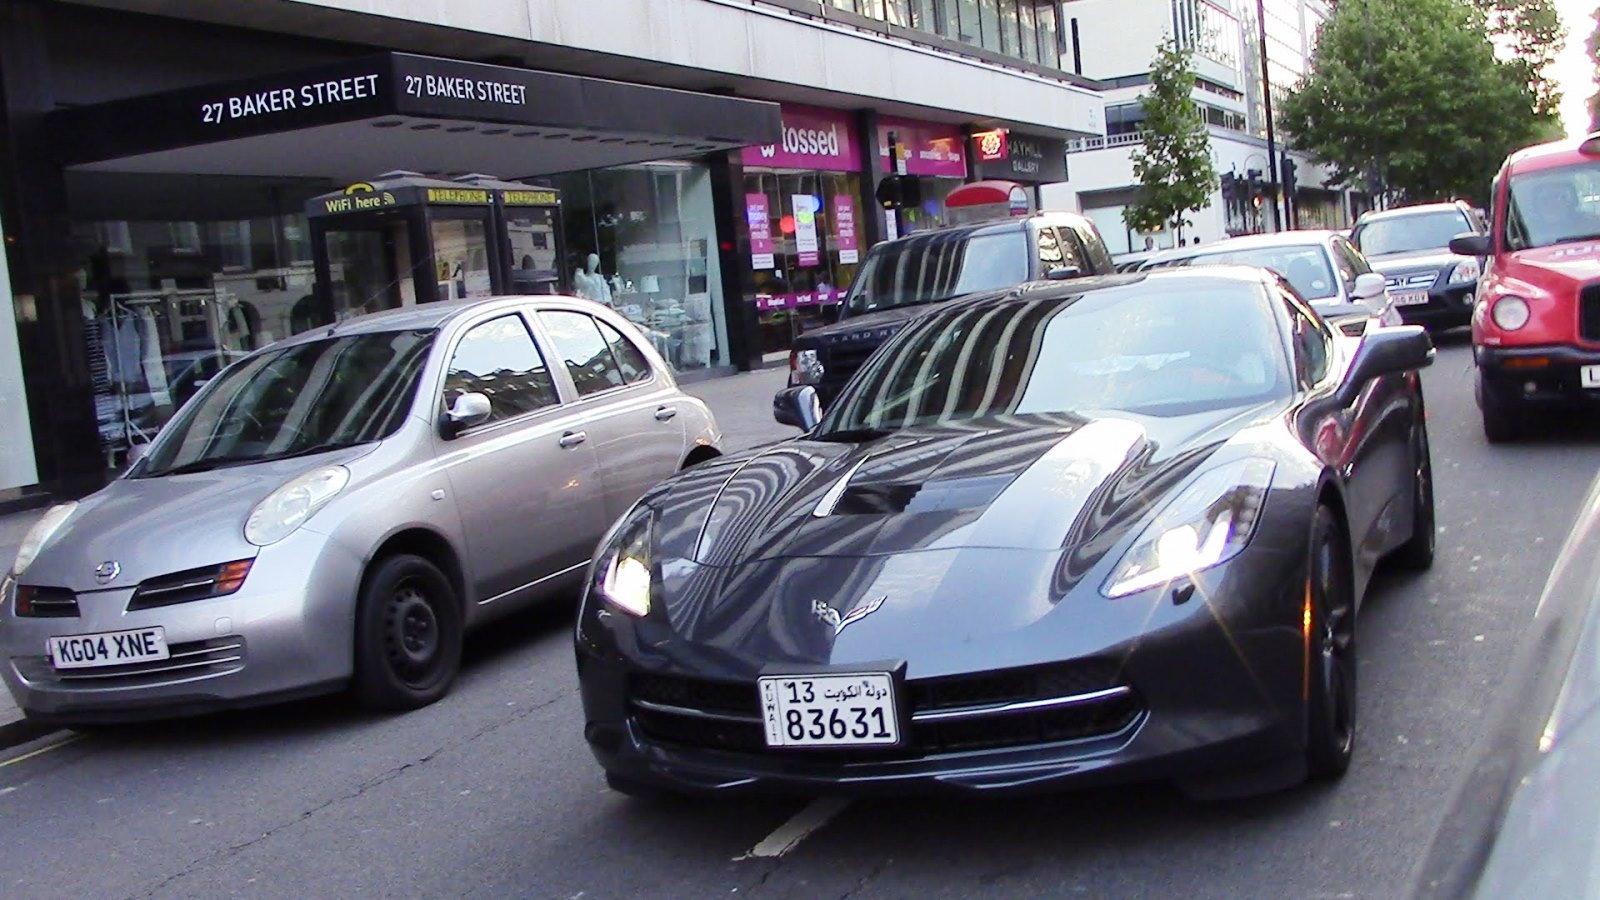 Kuwaiti Corvette in London